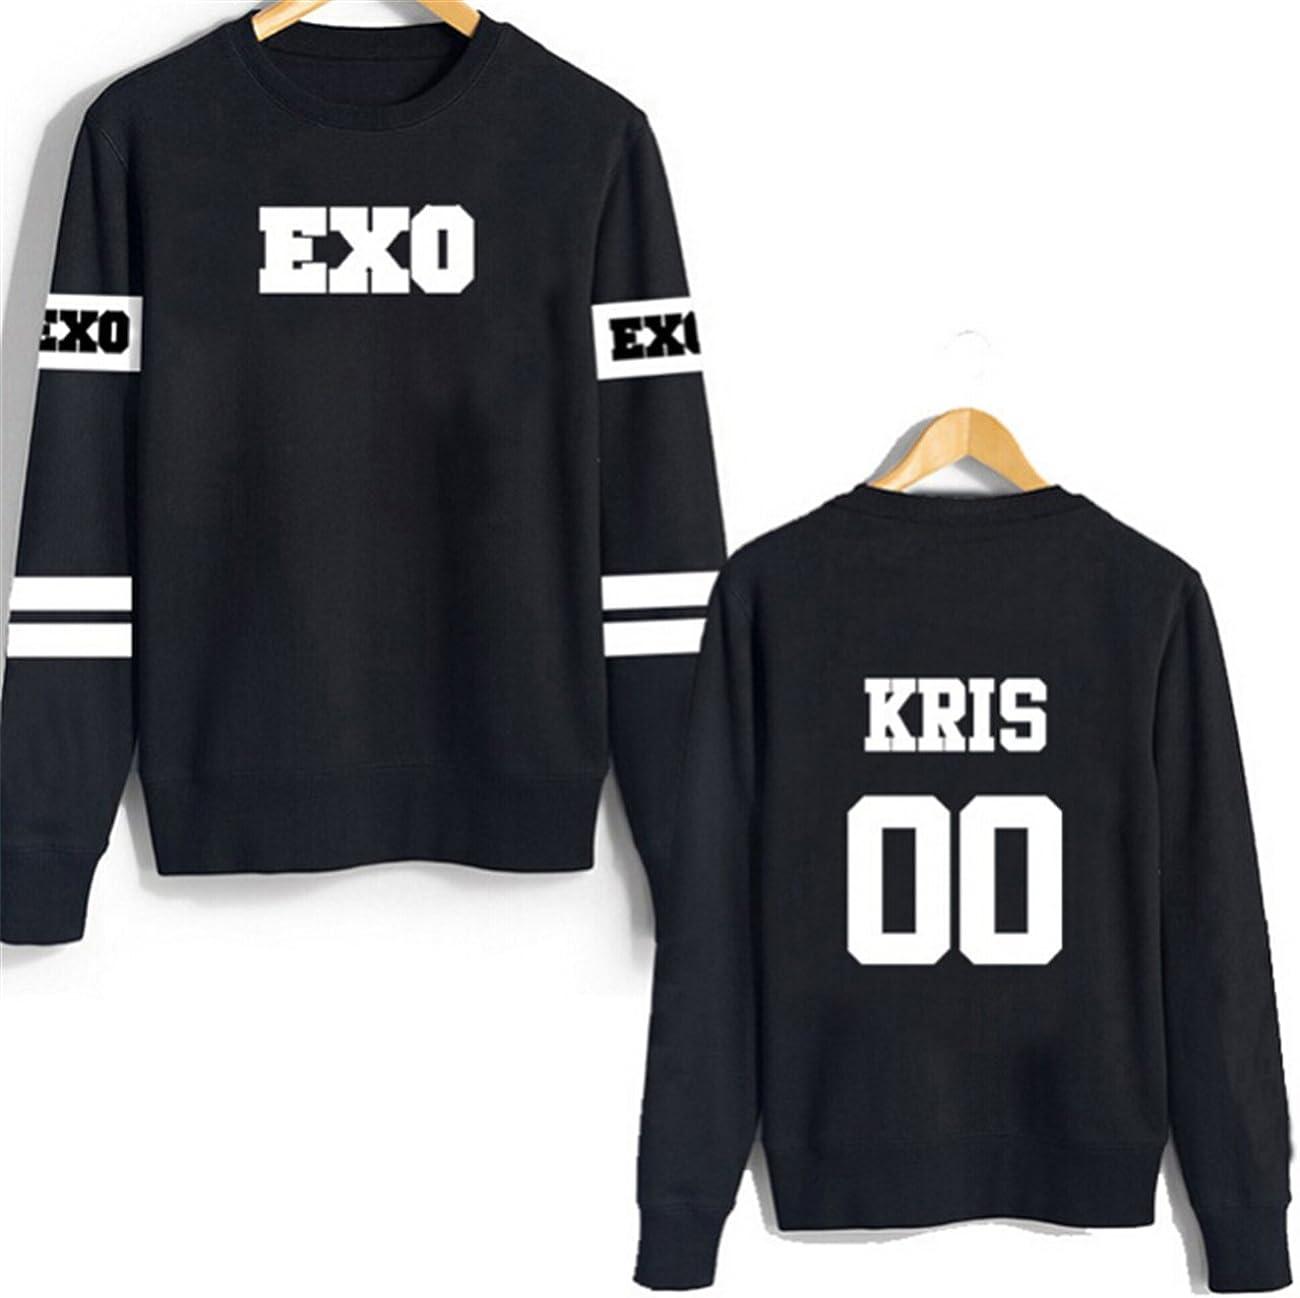 Korean POP EXO mon garçon est T-shirt sehun T-Shirt Kris Chanyeol baekhyun Coton Unisexe Tee